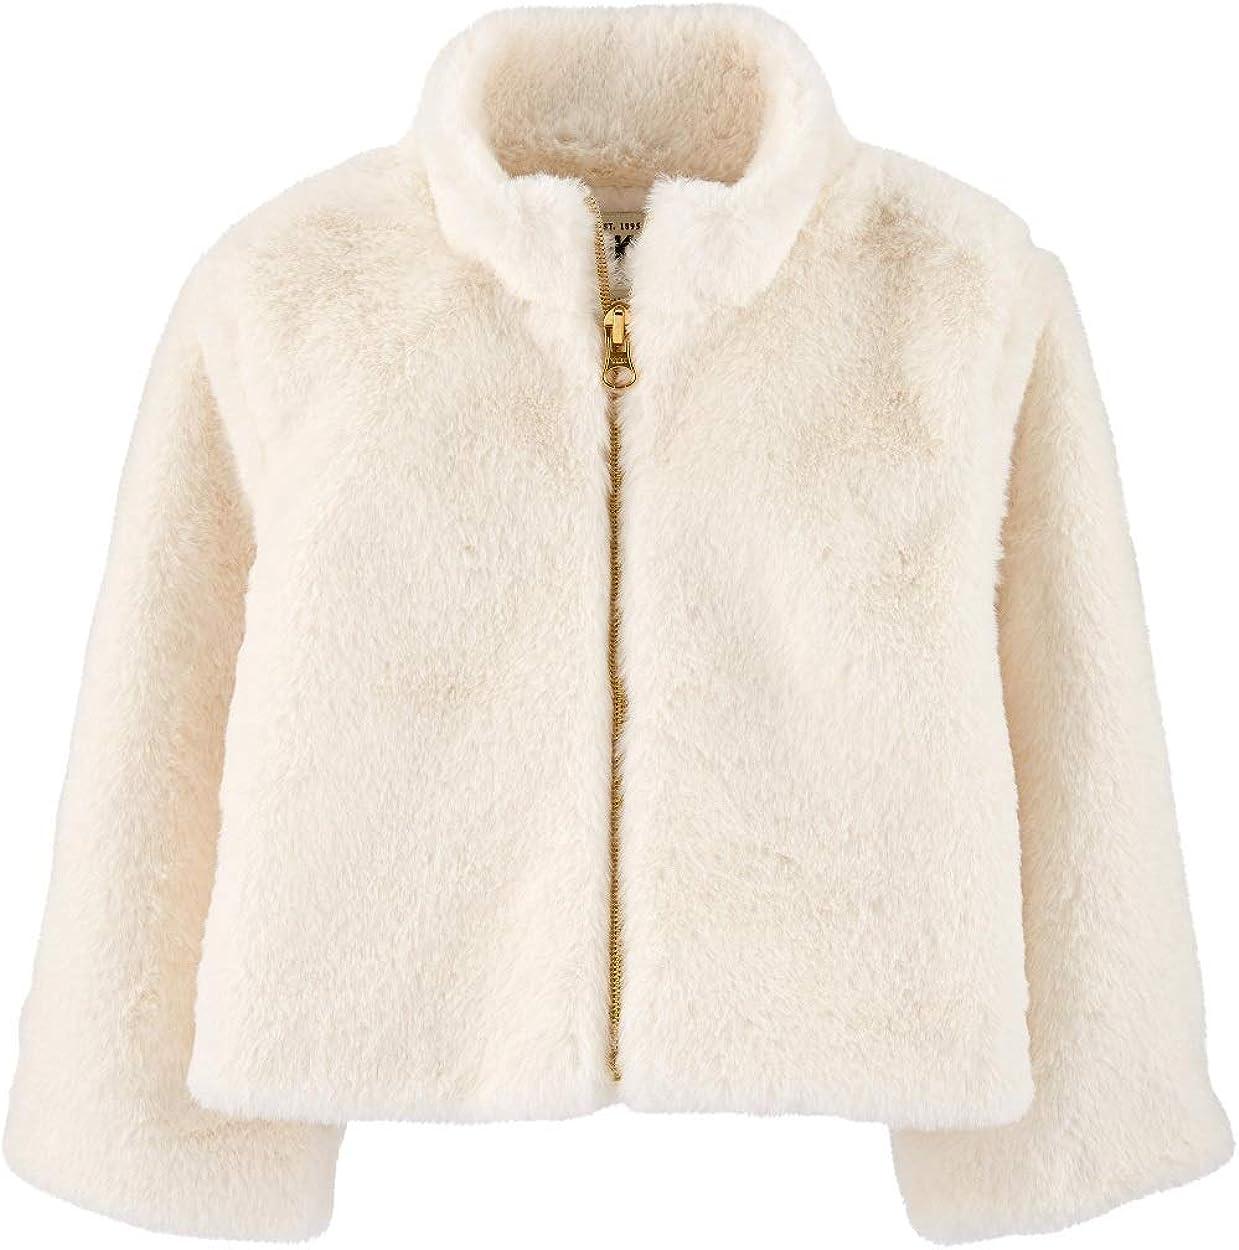 OshKosh B'gosh Girls' Super Soft Faux Fur Jacket with Full Zip Closure Size 4